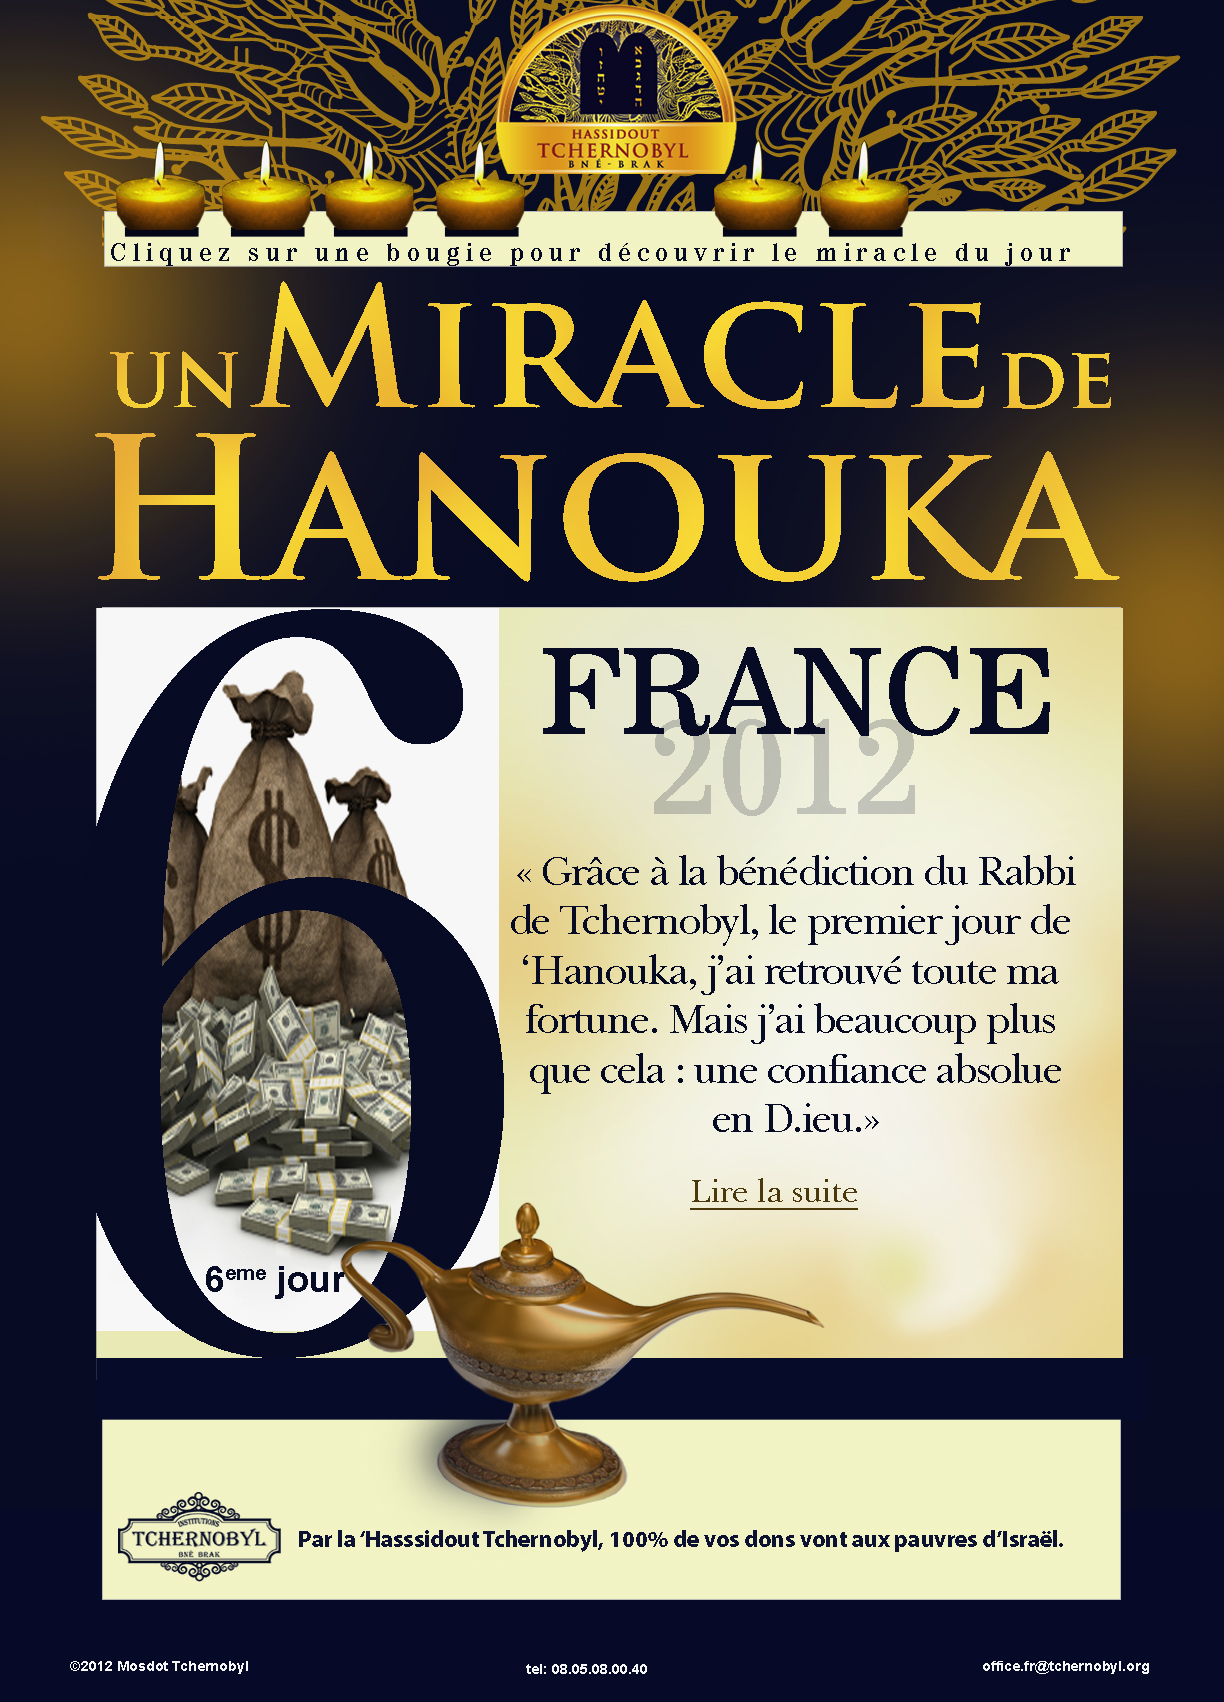 MIRACLE EN FRANCE –  «Après la segoula, ma vie a changé»